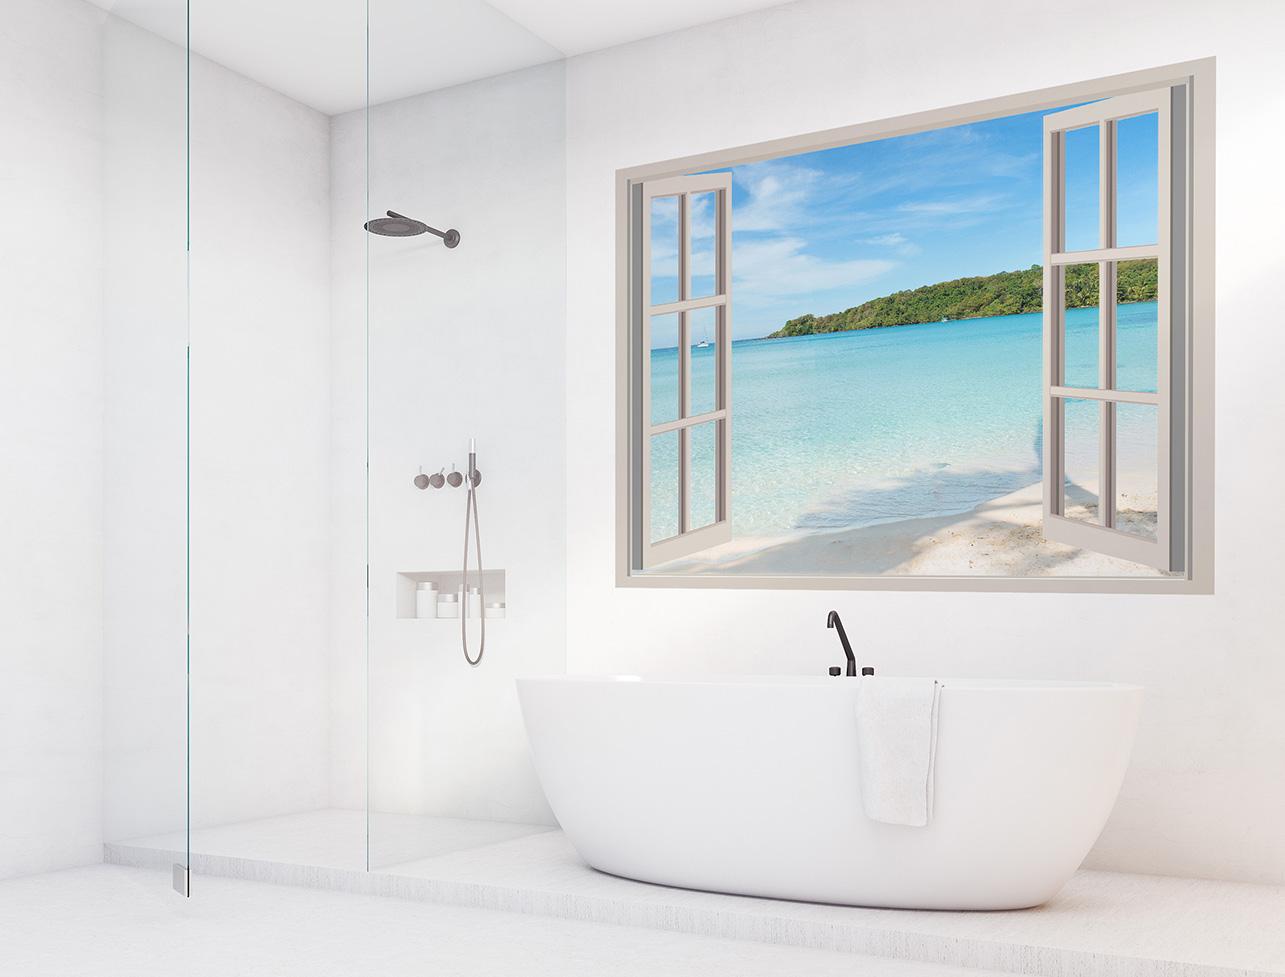 Fototapete Strand im Badezimmer